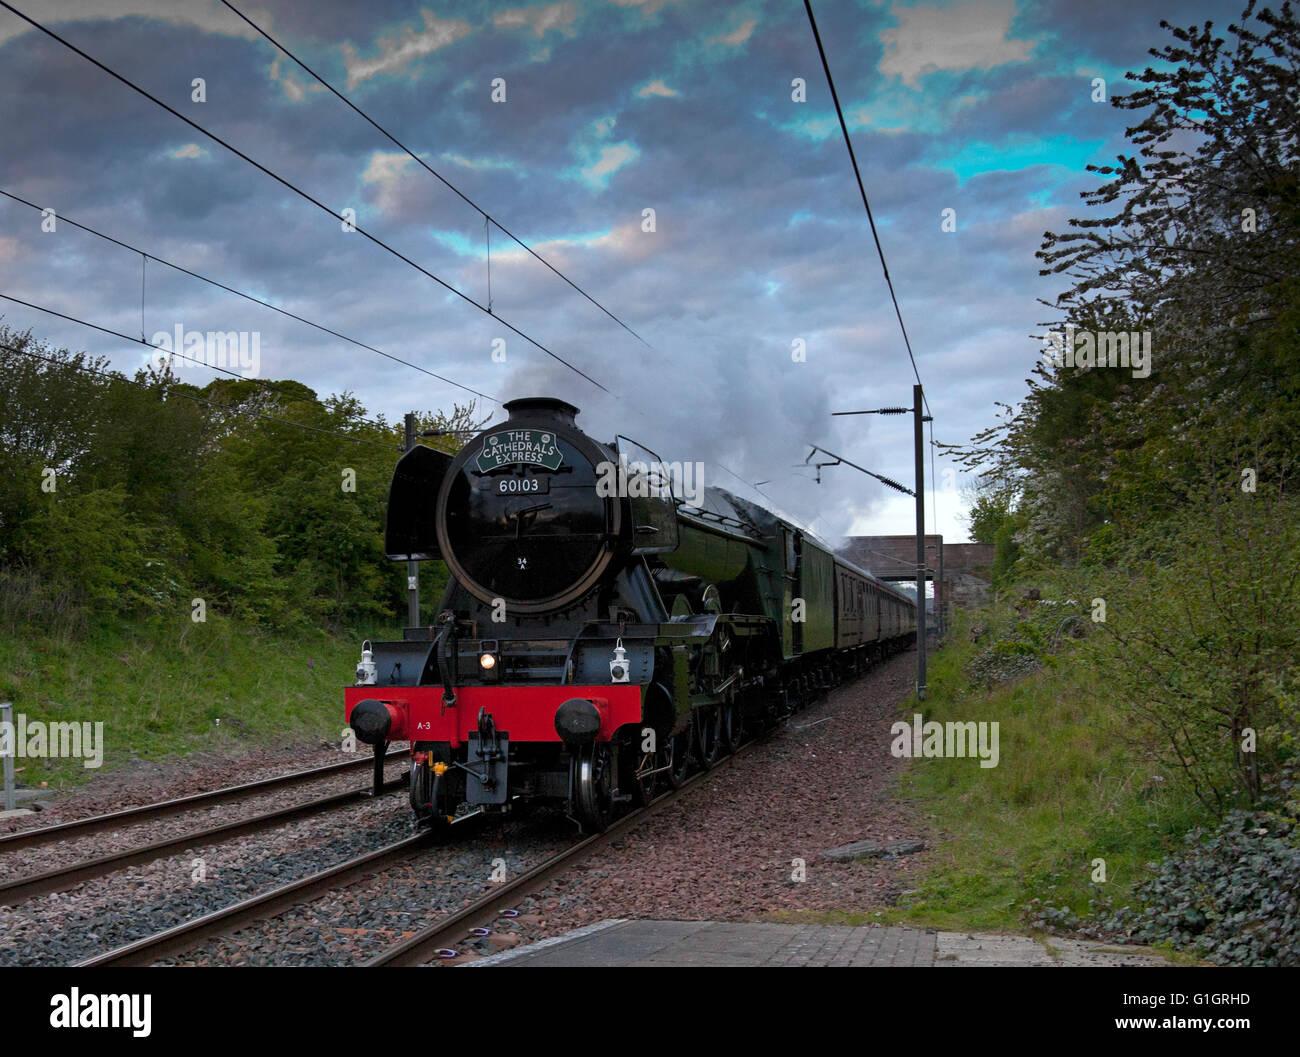 Wallyford, UK, 14 May 2016. The Flying Scotsman locomotive traveling to Edinburgh, Scotland through Wallyford station, Stock Photo